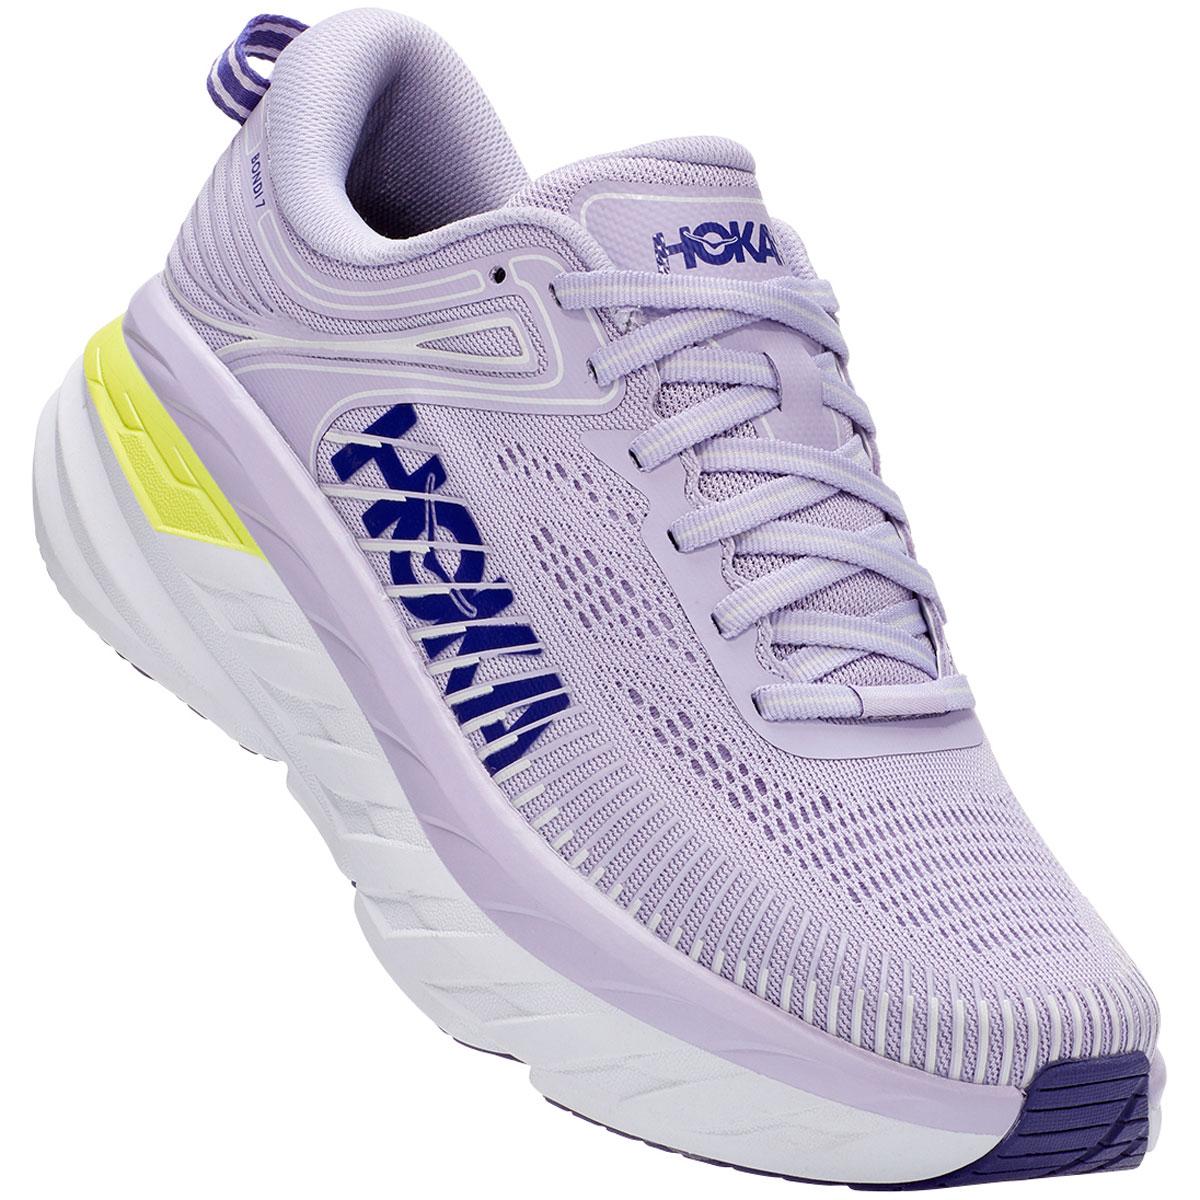 Women's Hoka One One Bondi 7 Running Shoe - Color: Purple Heather/Clematis Blue - Size: 5 - Width: Regular, Purple Heather/Clematis Blue, large, image 4